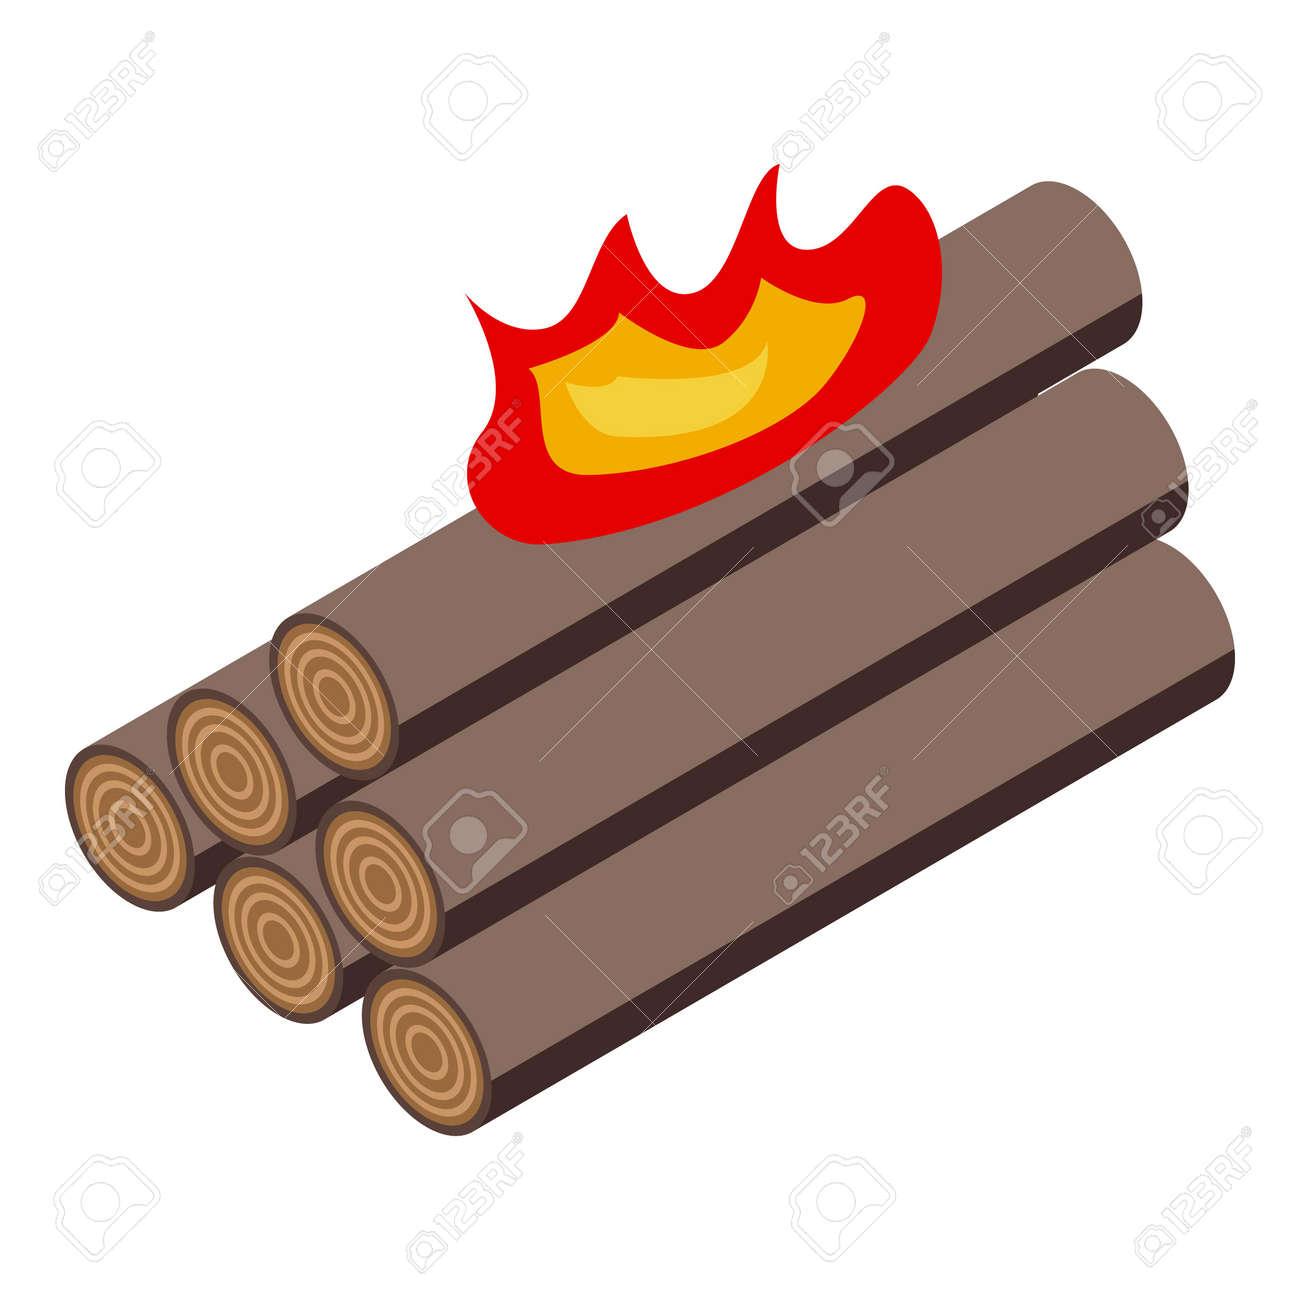 Burning logs icon. Isometric of Burning logs vector icon for web design isolated on white background - 169992828